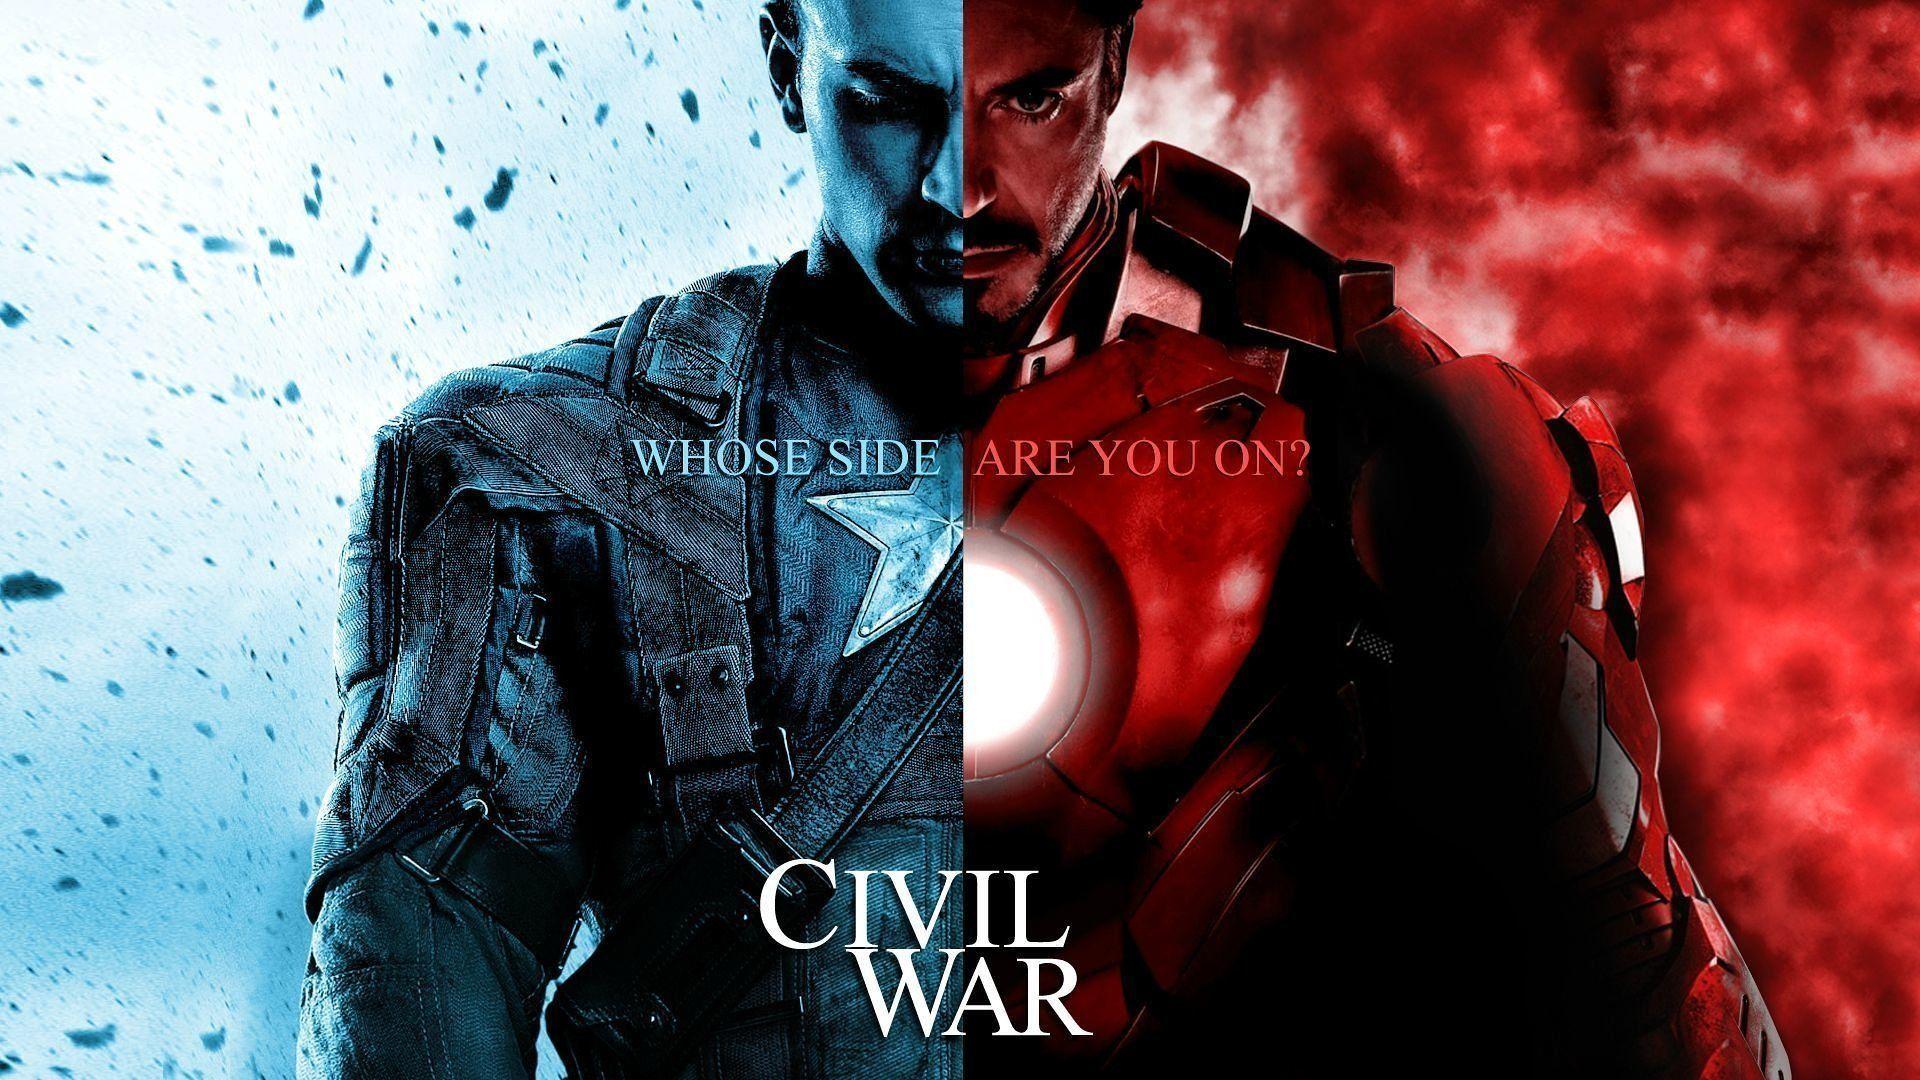 Captain America Civil War HD Wallpapers Backgrounds HD